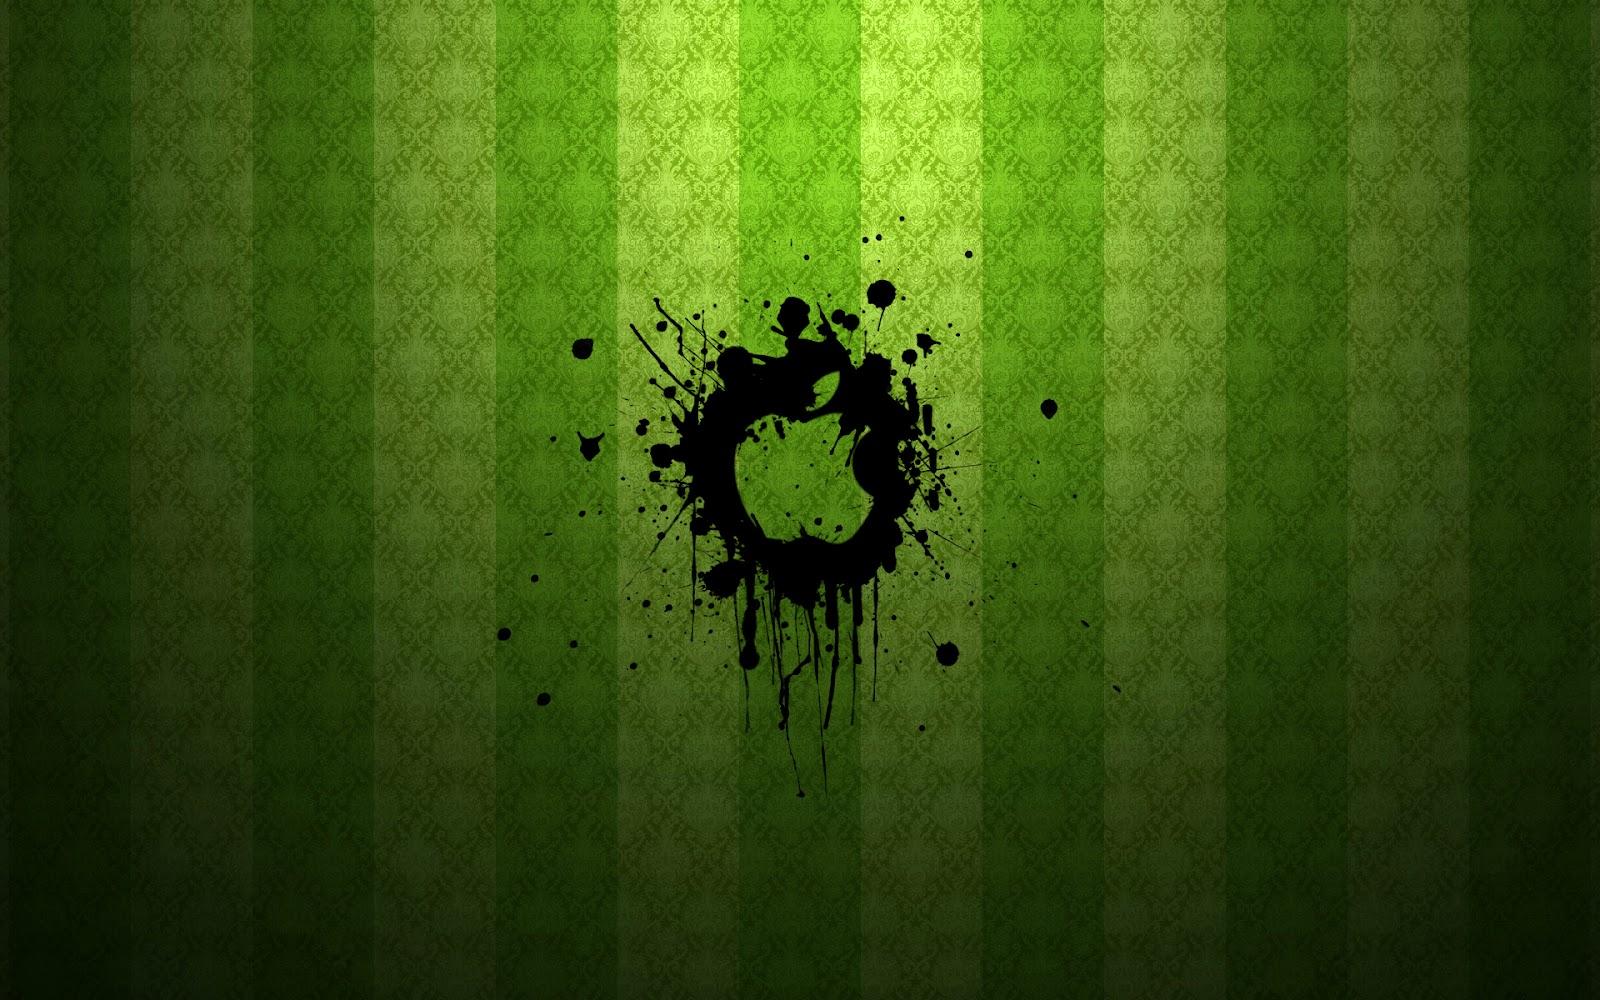 http://1.bp.blogspot.com/-fP_2nGhClHI/UD3TZb3s2eI/AAAAAAAAARc/wsdZAkv4VEY/s1600/Green%2Bcolour%2Bwallpaper%2Bwith%2Bapple%2Blogo%2Bin%2Bblack%2Bshades.jpg